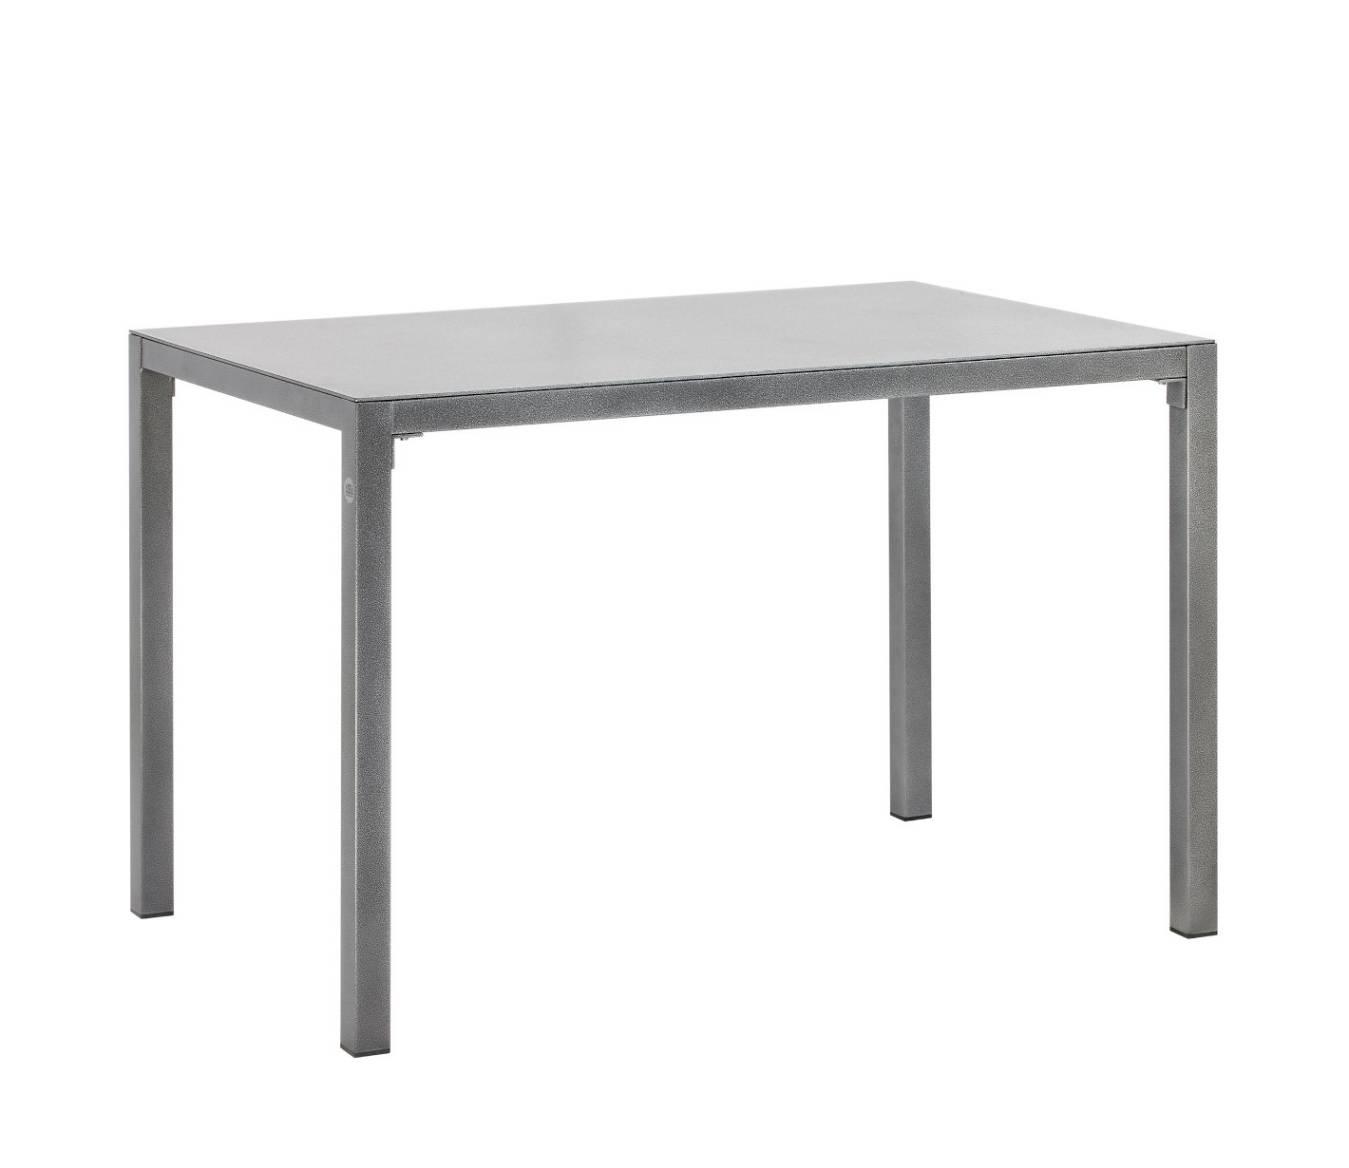 iSimar Altea Gartentisch Design Möbel